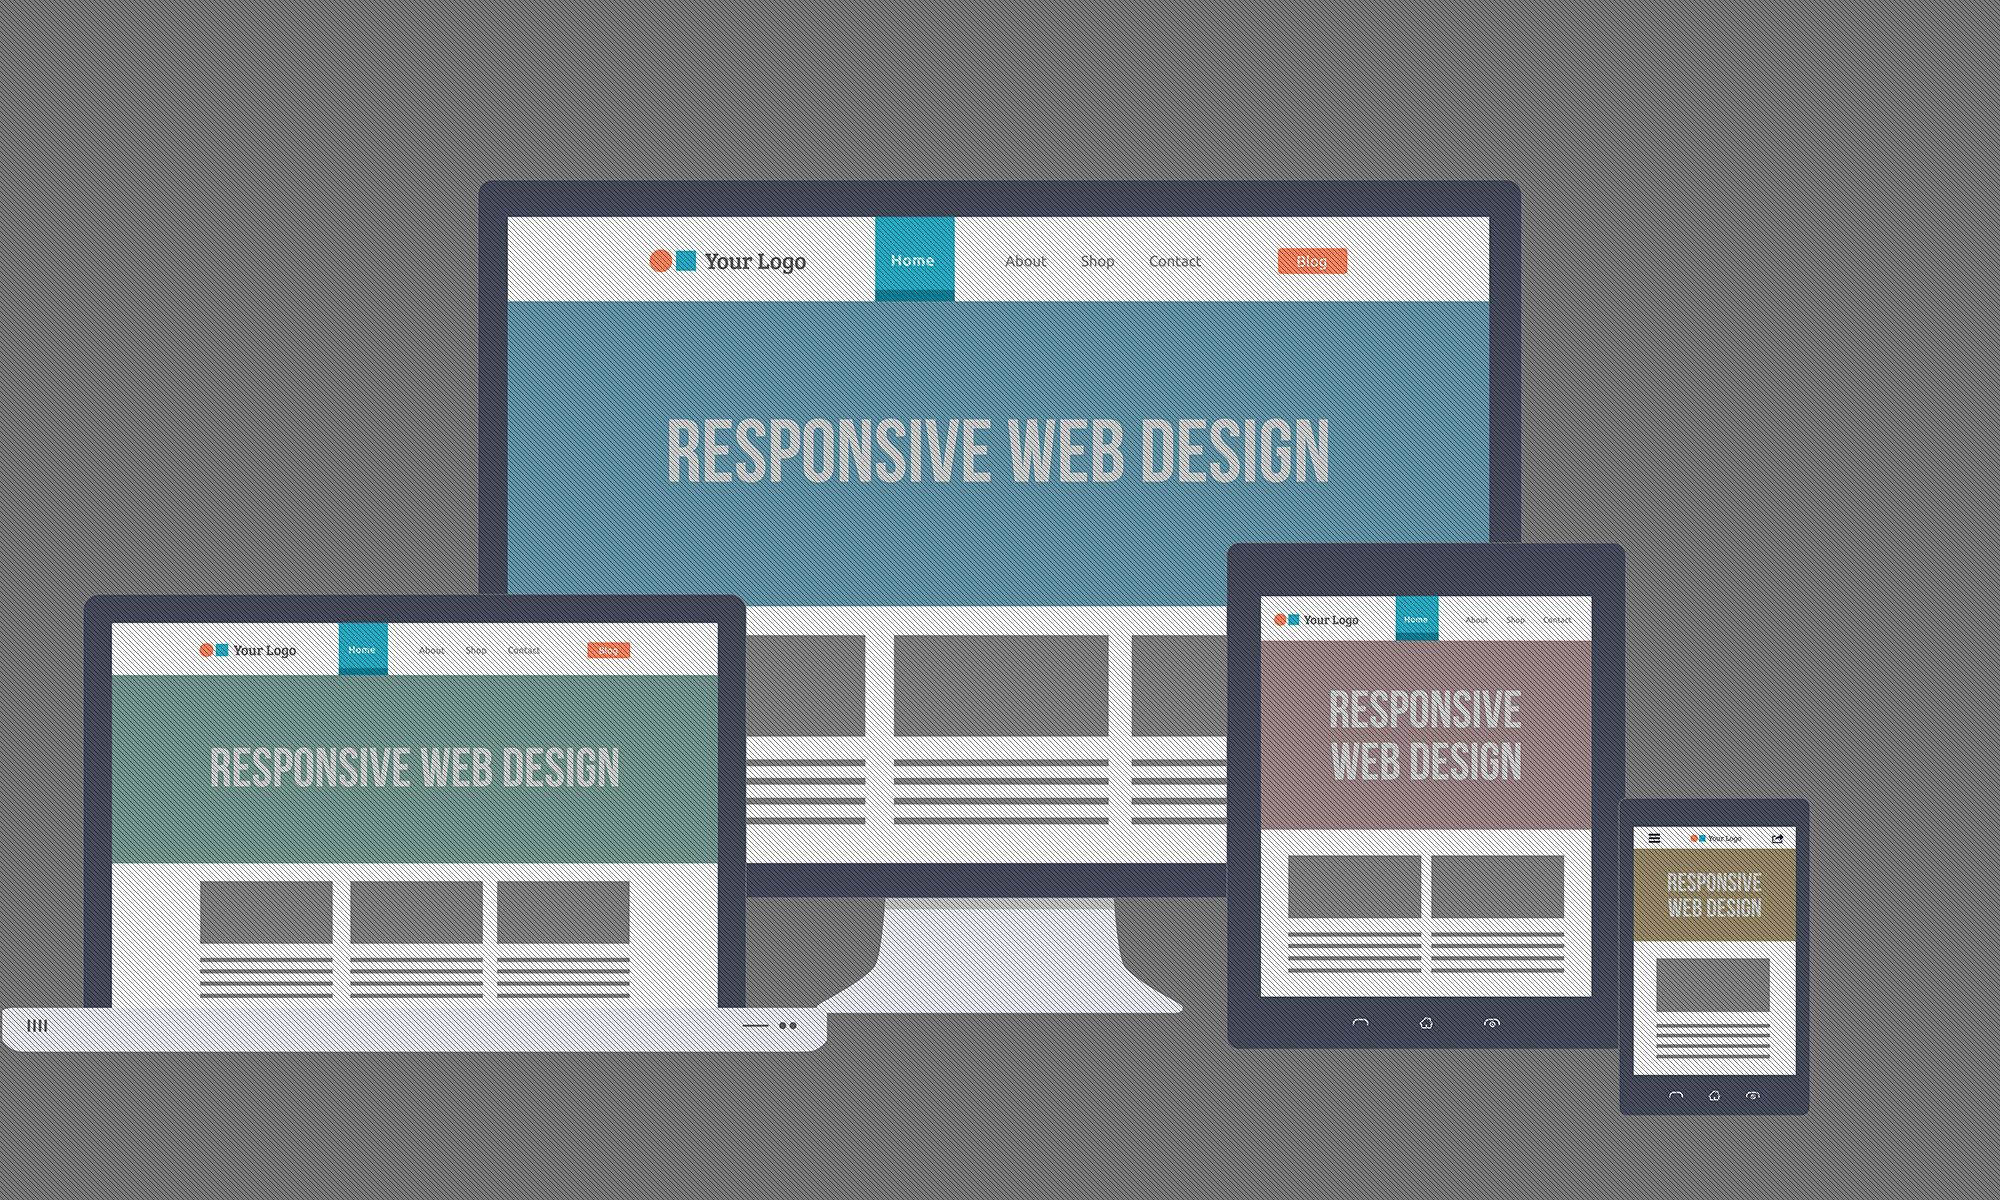 responsive-web-design-grid